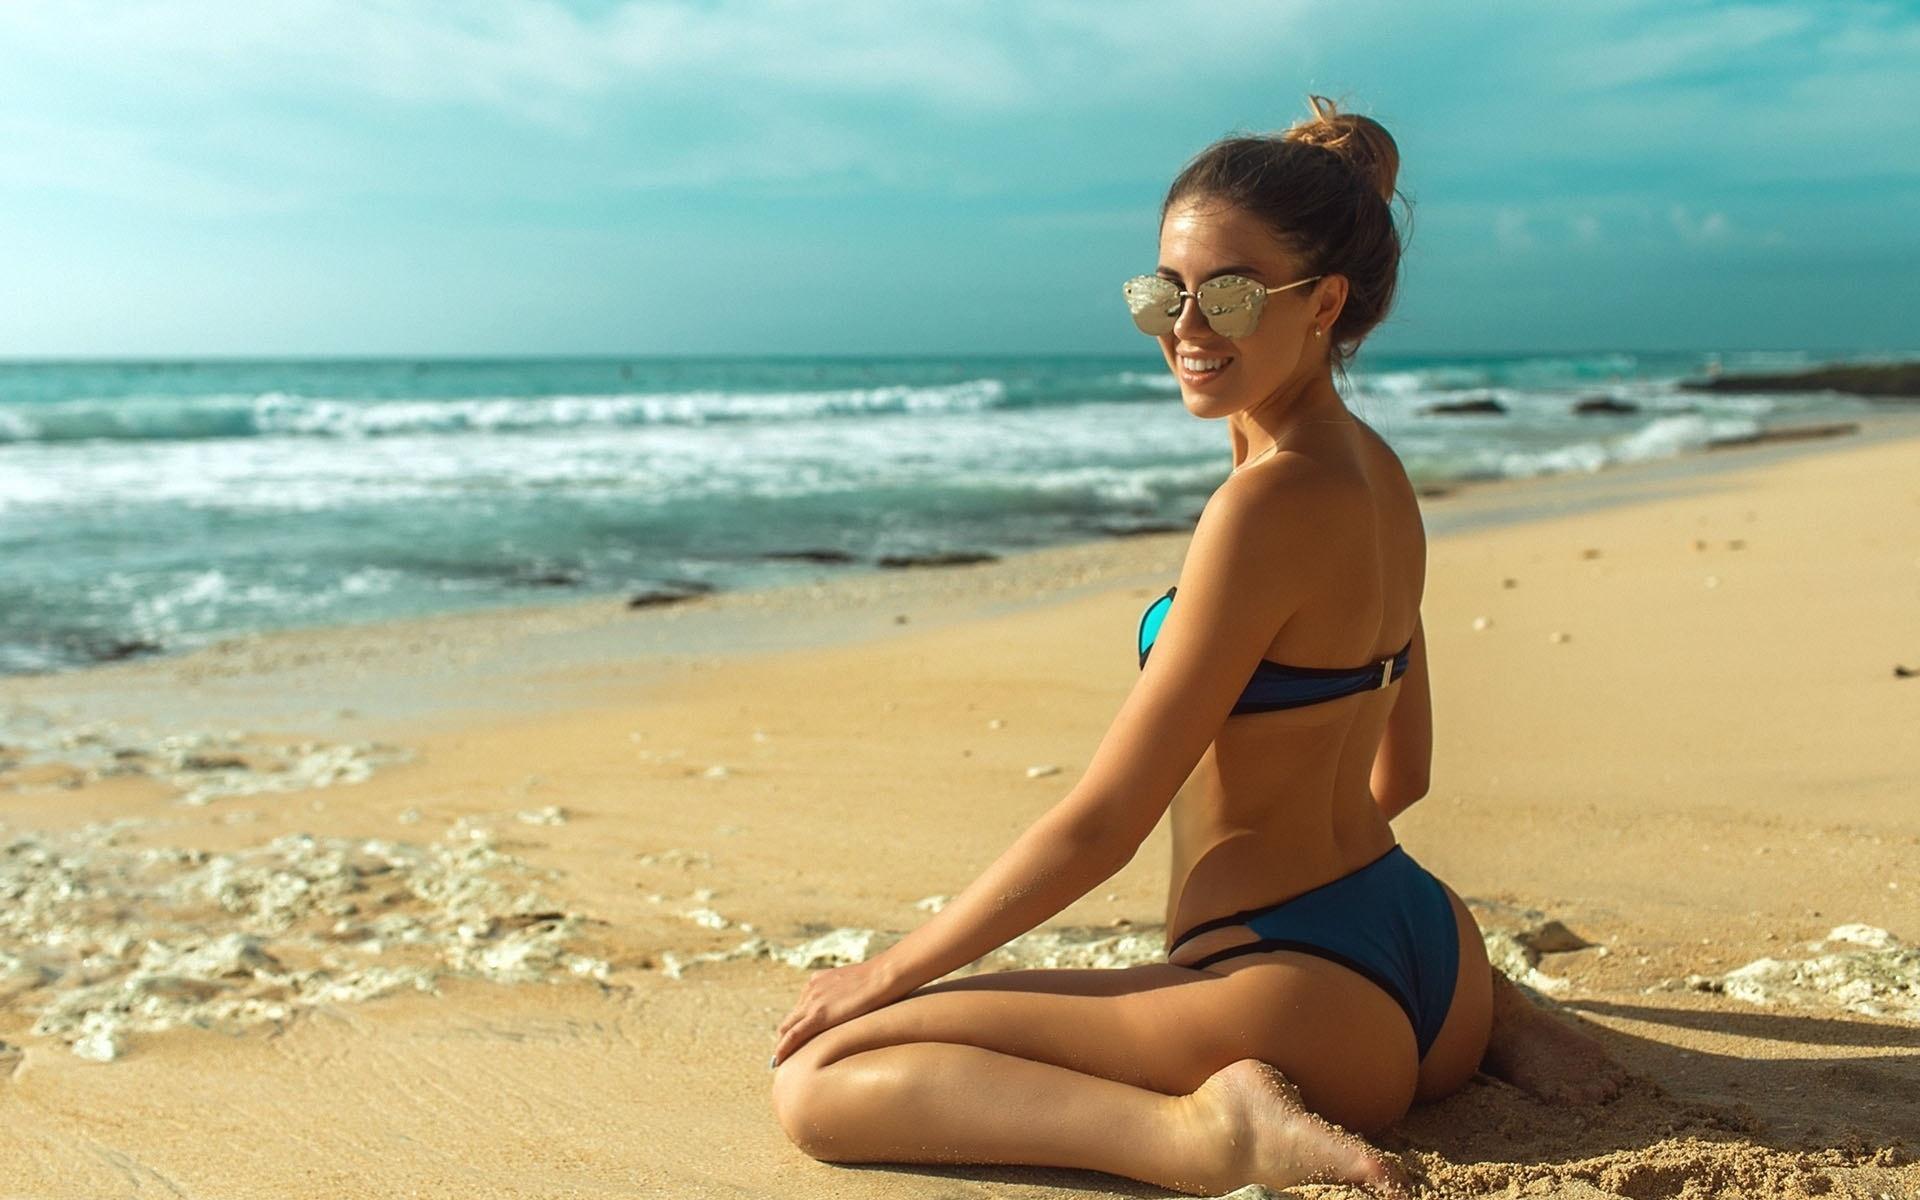 women, tanned, kneeling, ass, sunglasses, back, sand, sea, women outdoors, bikini, smiling, beach, очки, пучок, волна